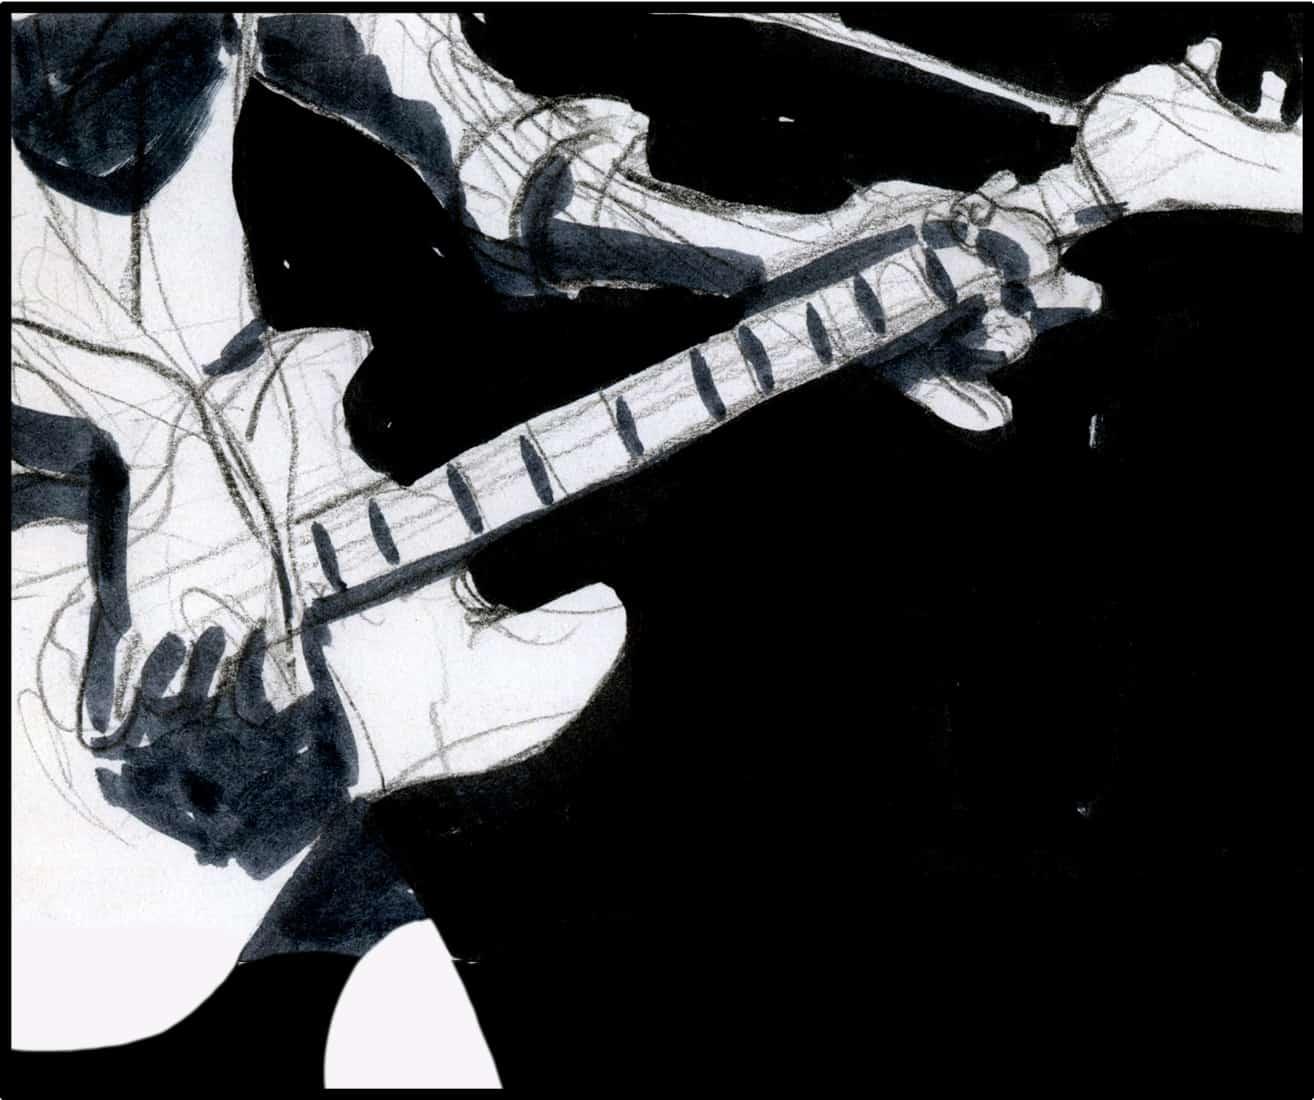 Blues_Brothers_sc_B13_pnl_1